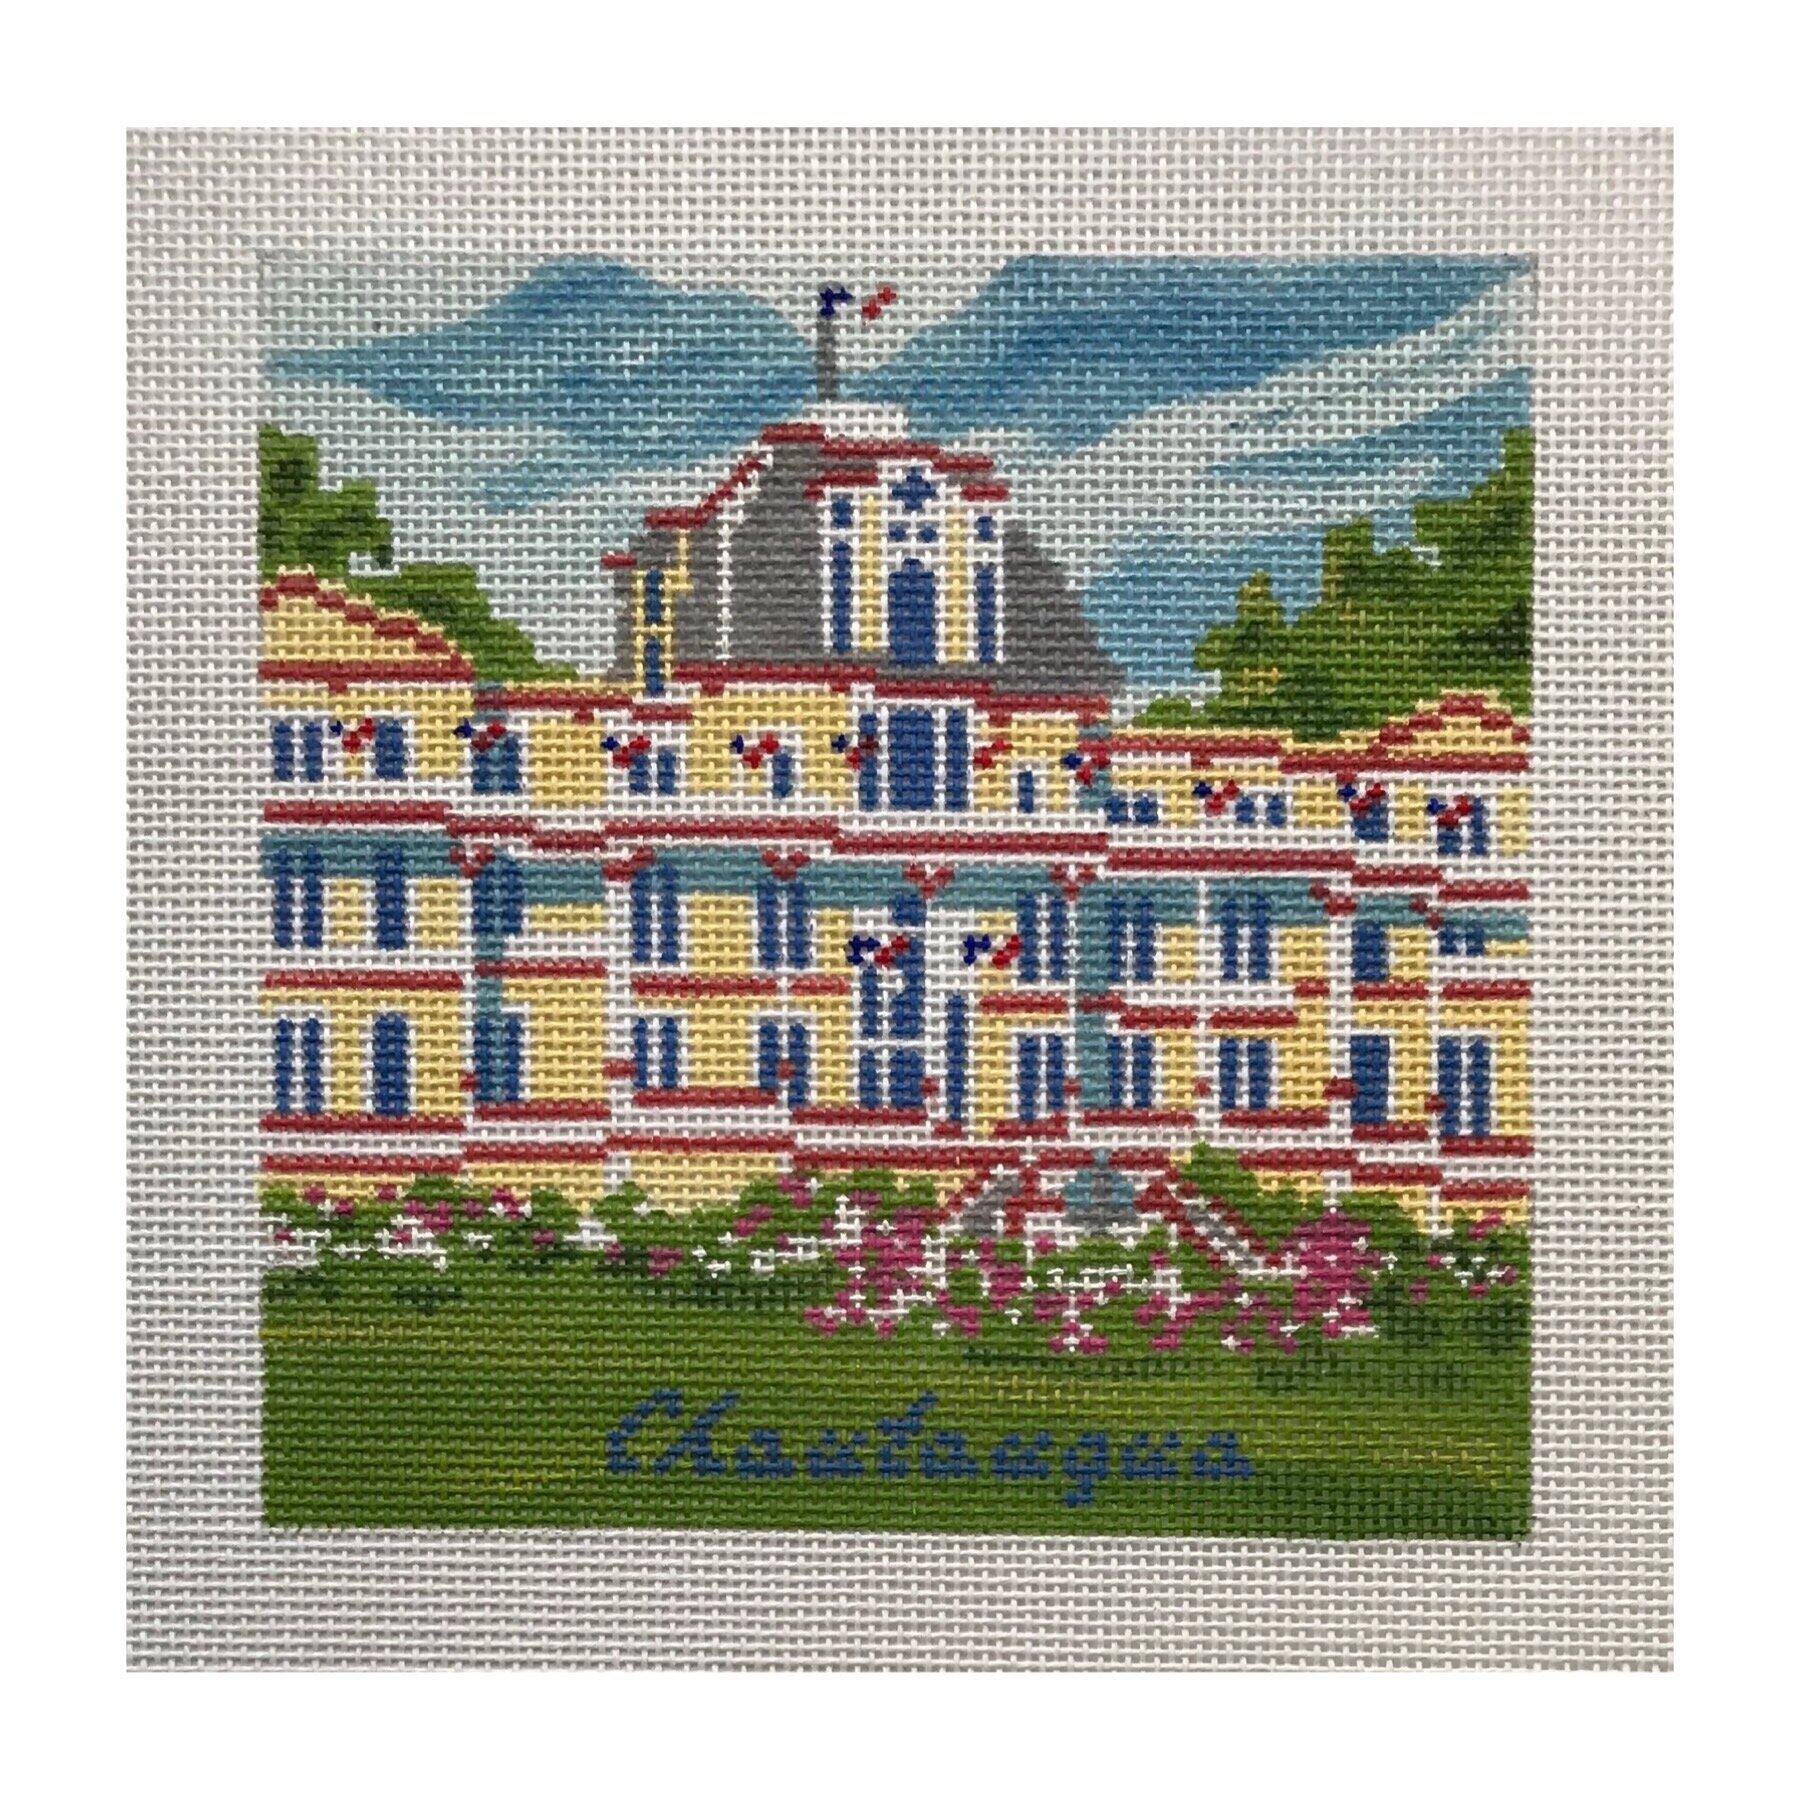 "The Athenaeum Hotel - Chautauqua AL68   5"" x 5"" on 18 mesh"